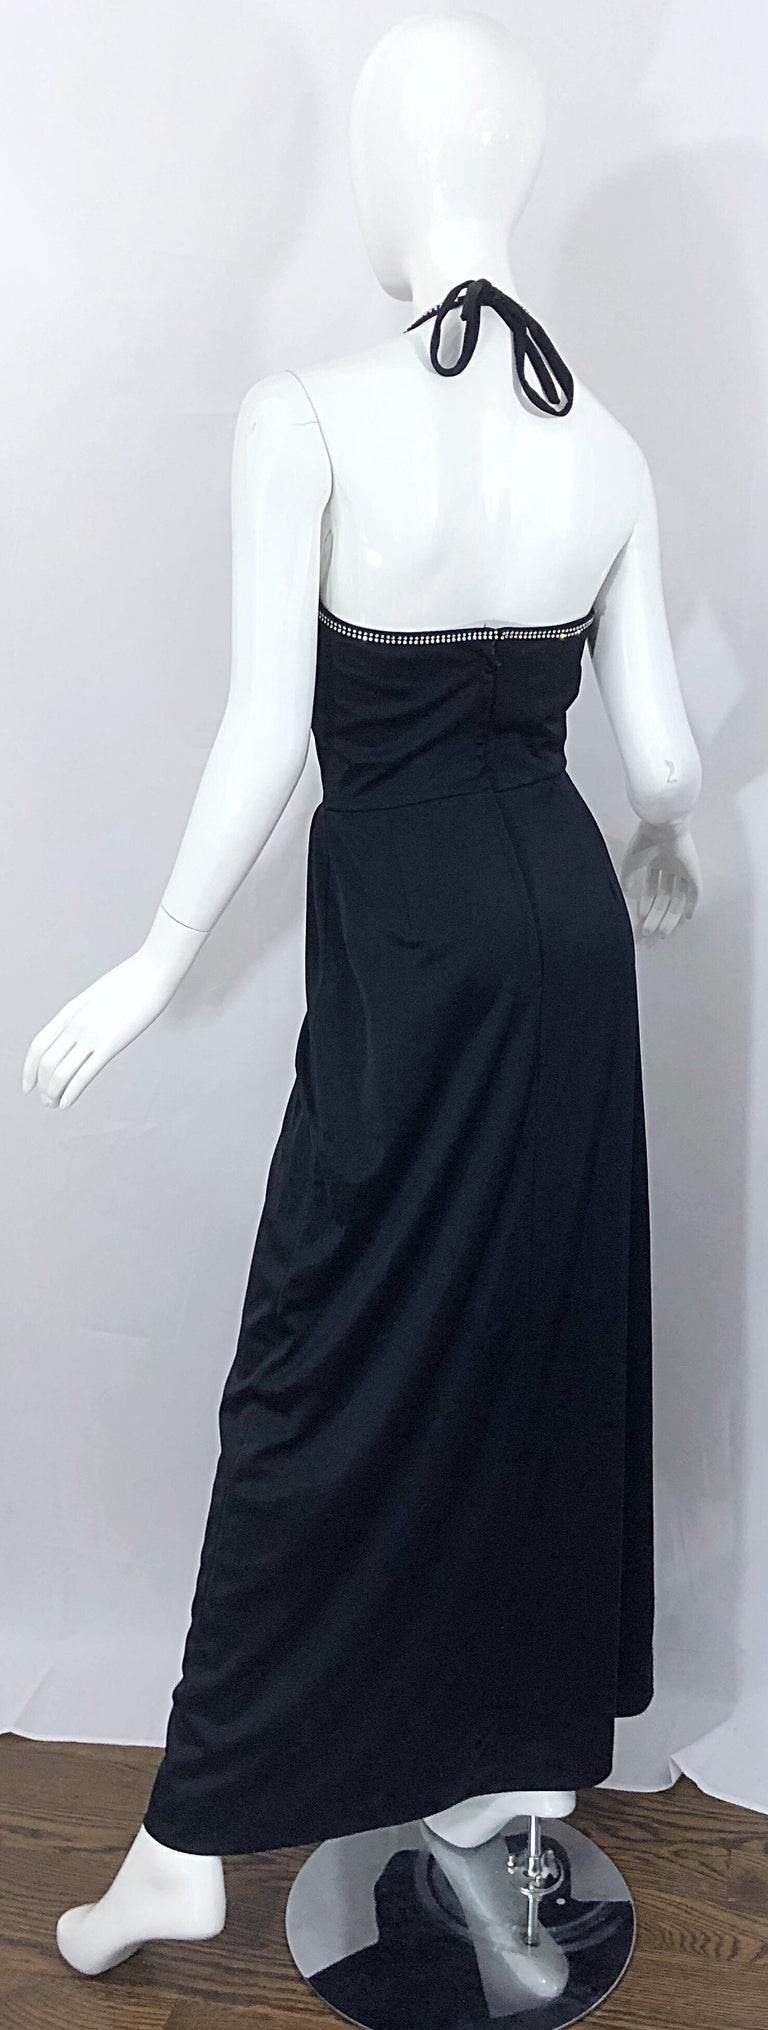 1970s Lilli Diamond Black Jersey Rhinestone Vintage 70s Wrap Maxi Dress Gown For Sale 9